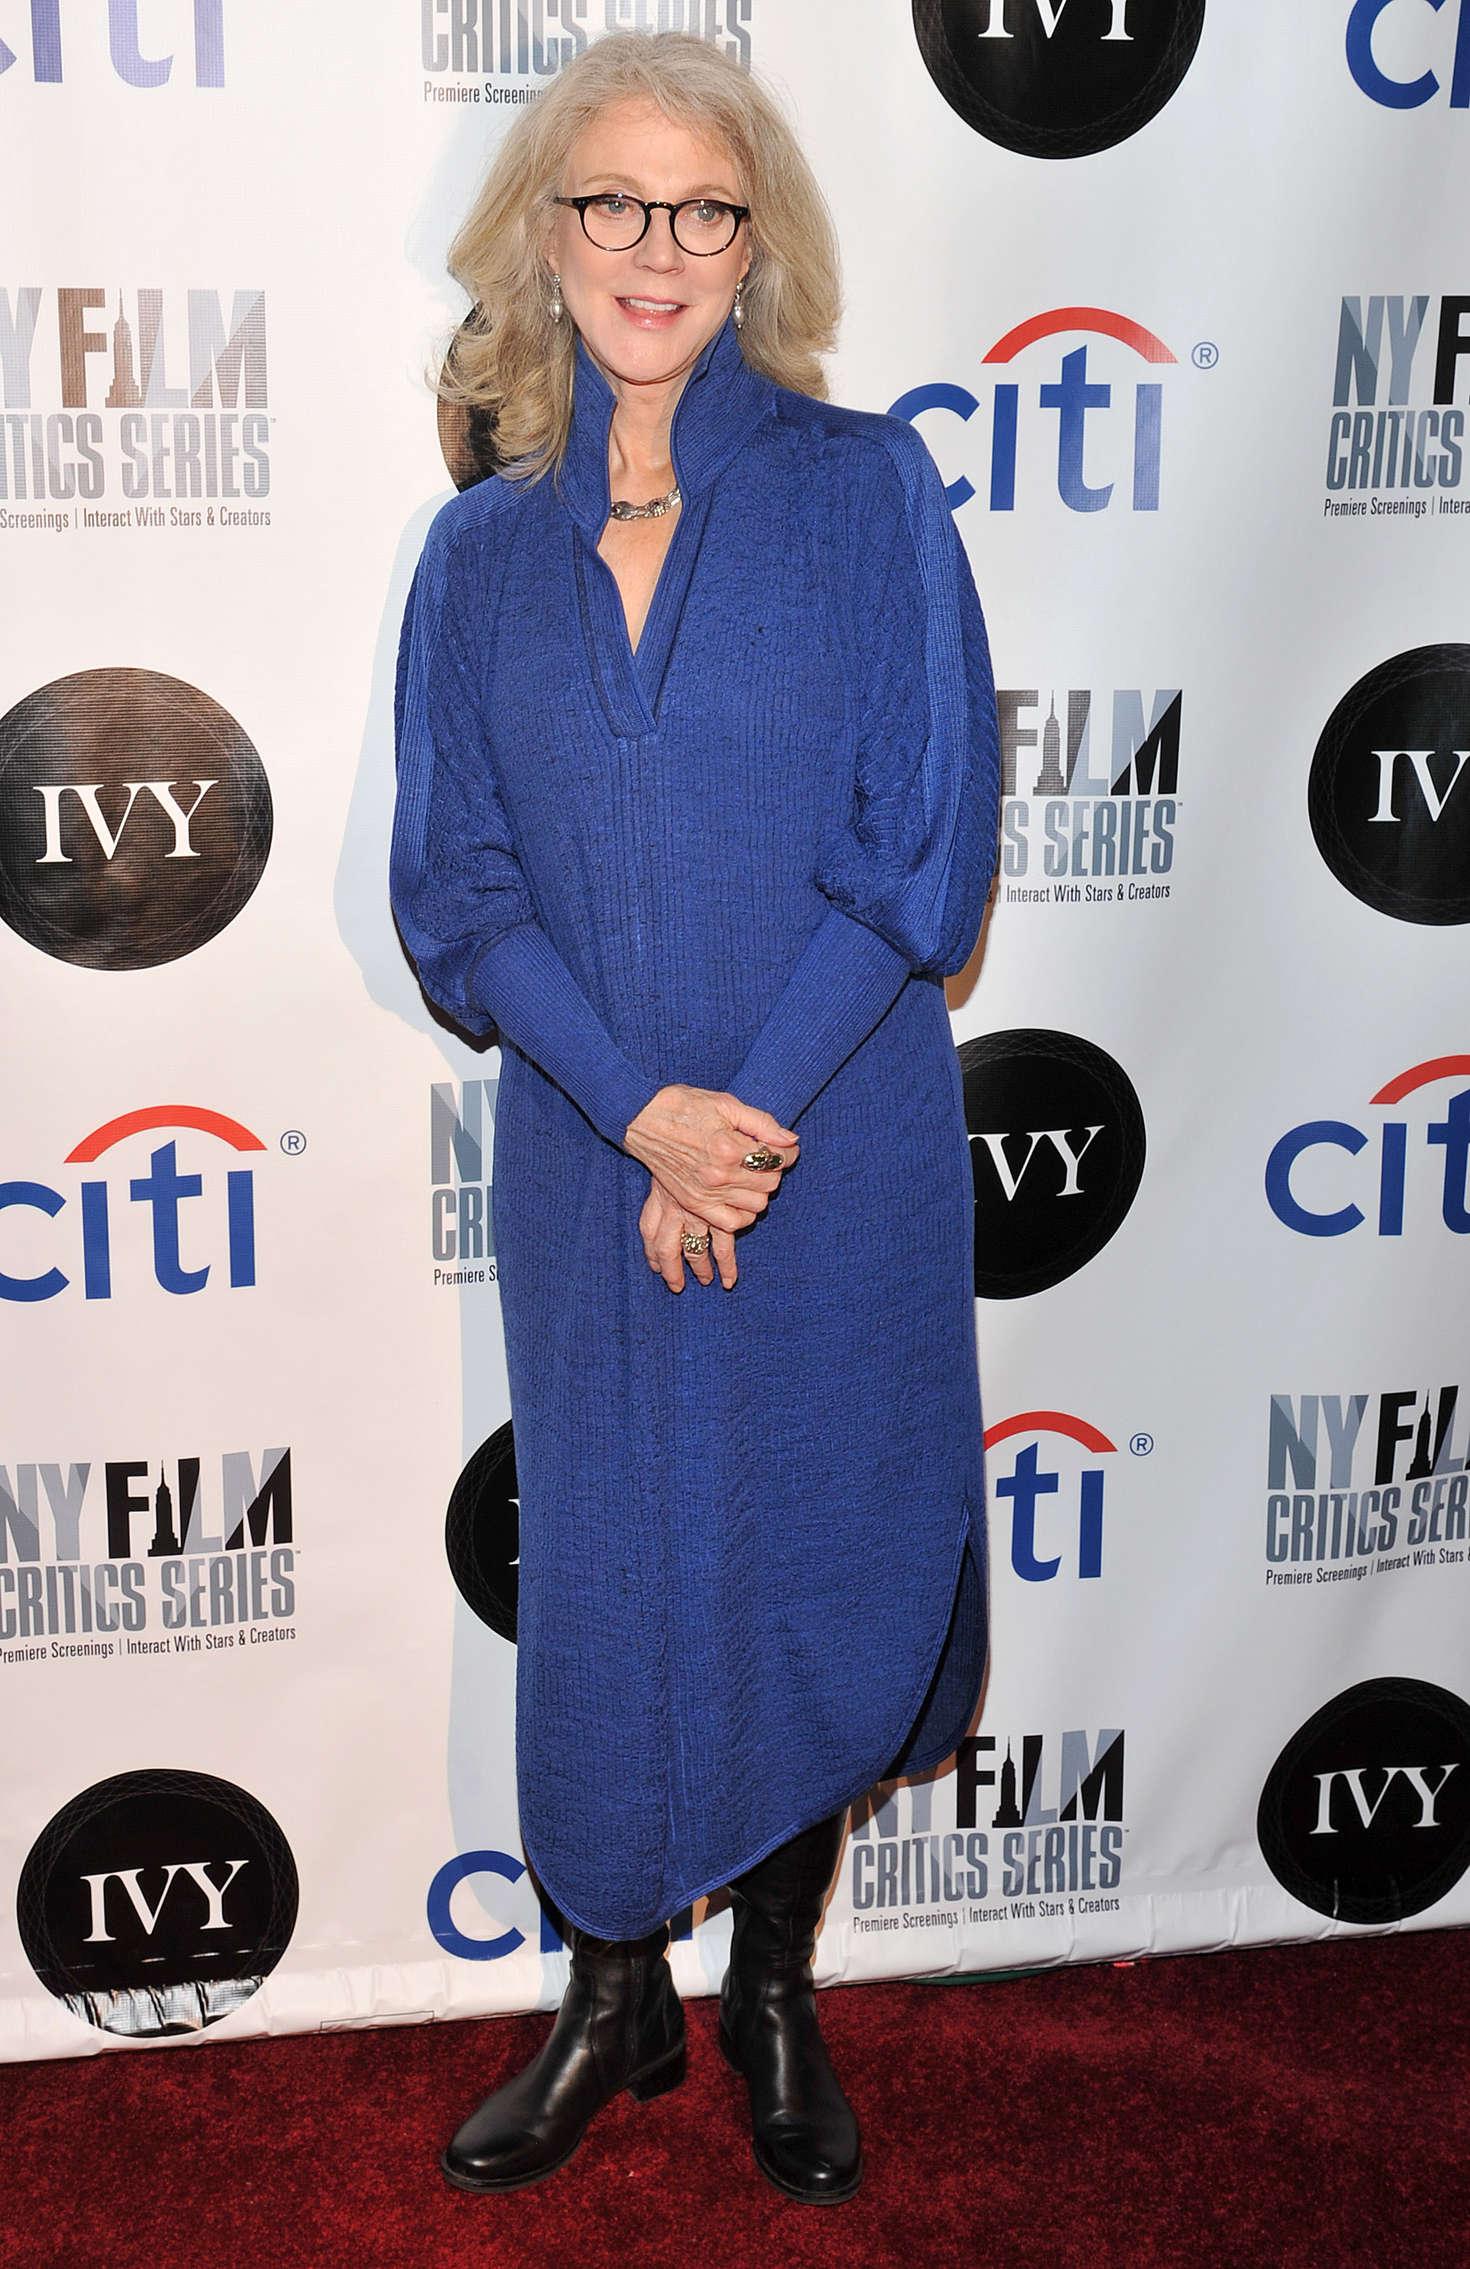 Blythe Danner Tumbledown Screening in New York